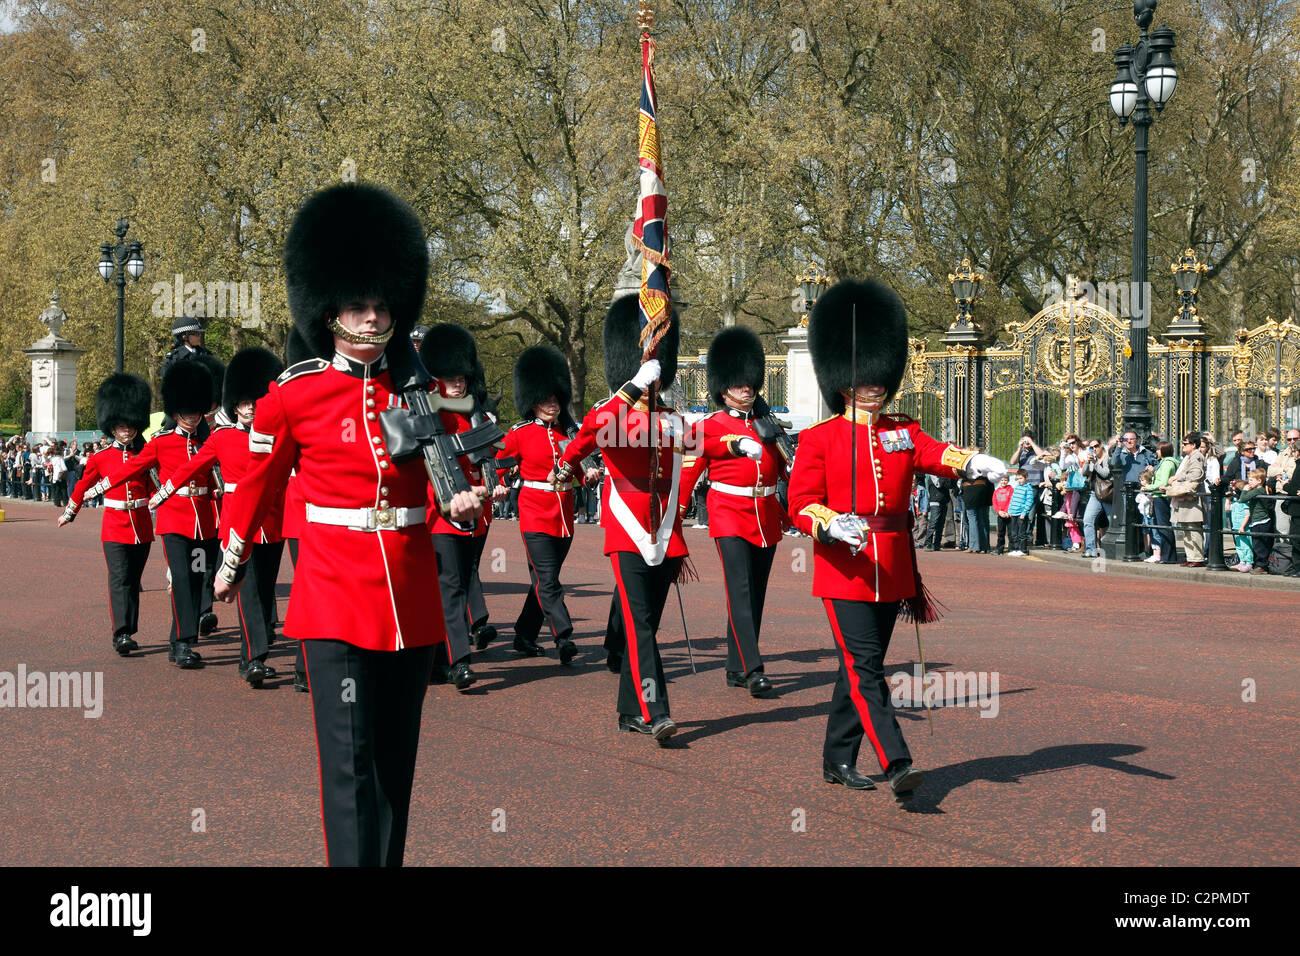 Grenadier Guards at Buckingham Palace - Stock Image